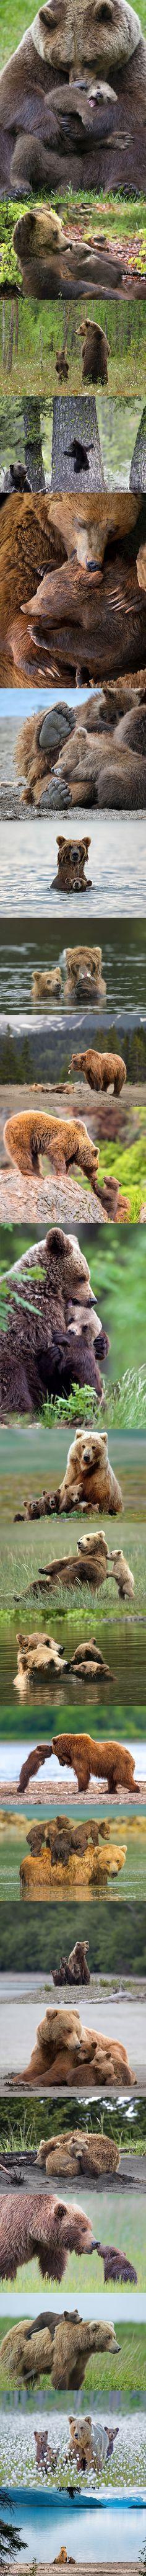 Maman ours grizzli et ses petits